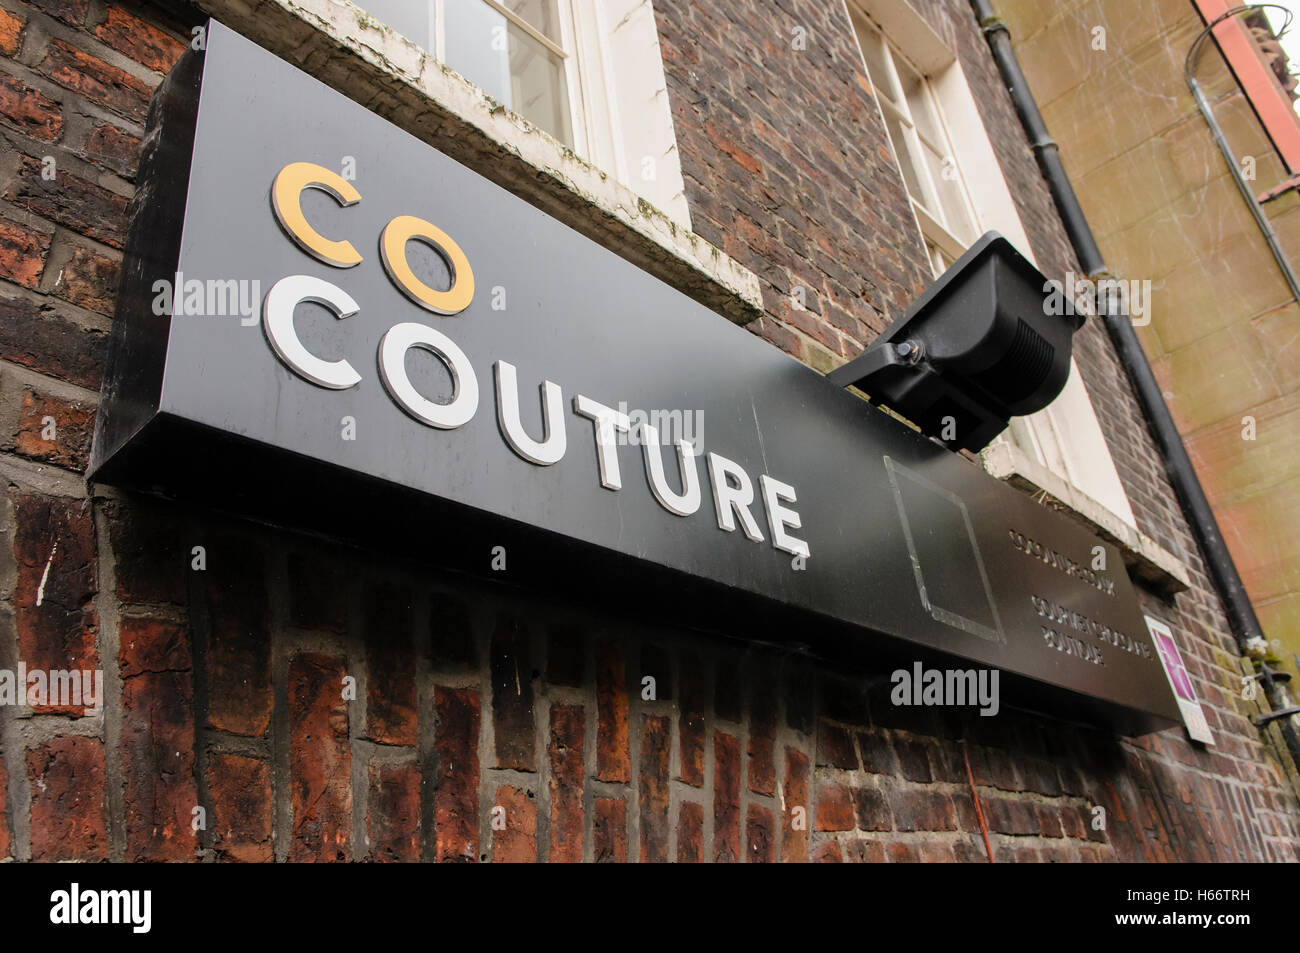 Co Couture, Belfast, an award winning chocolatier. - Stock Image